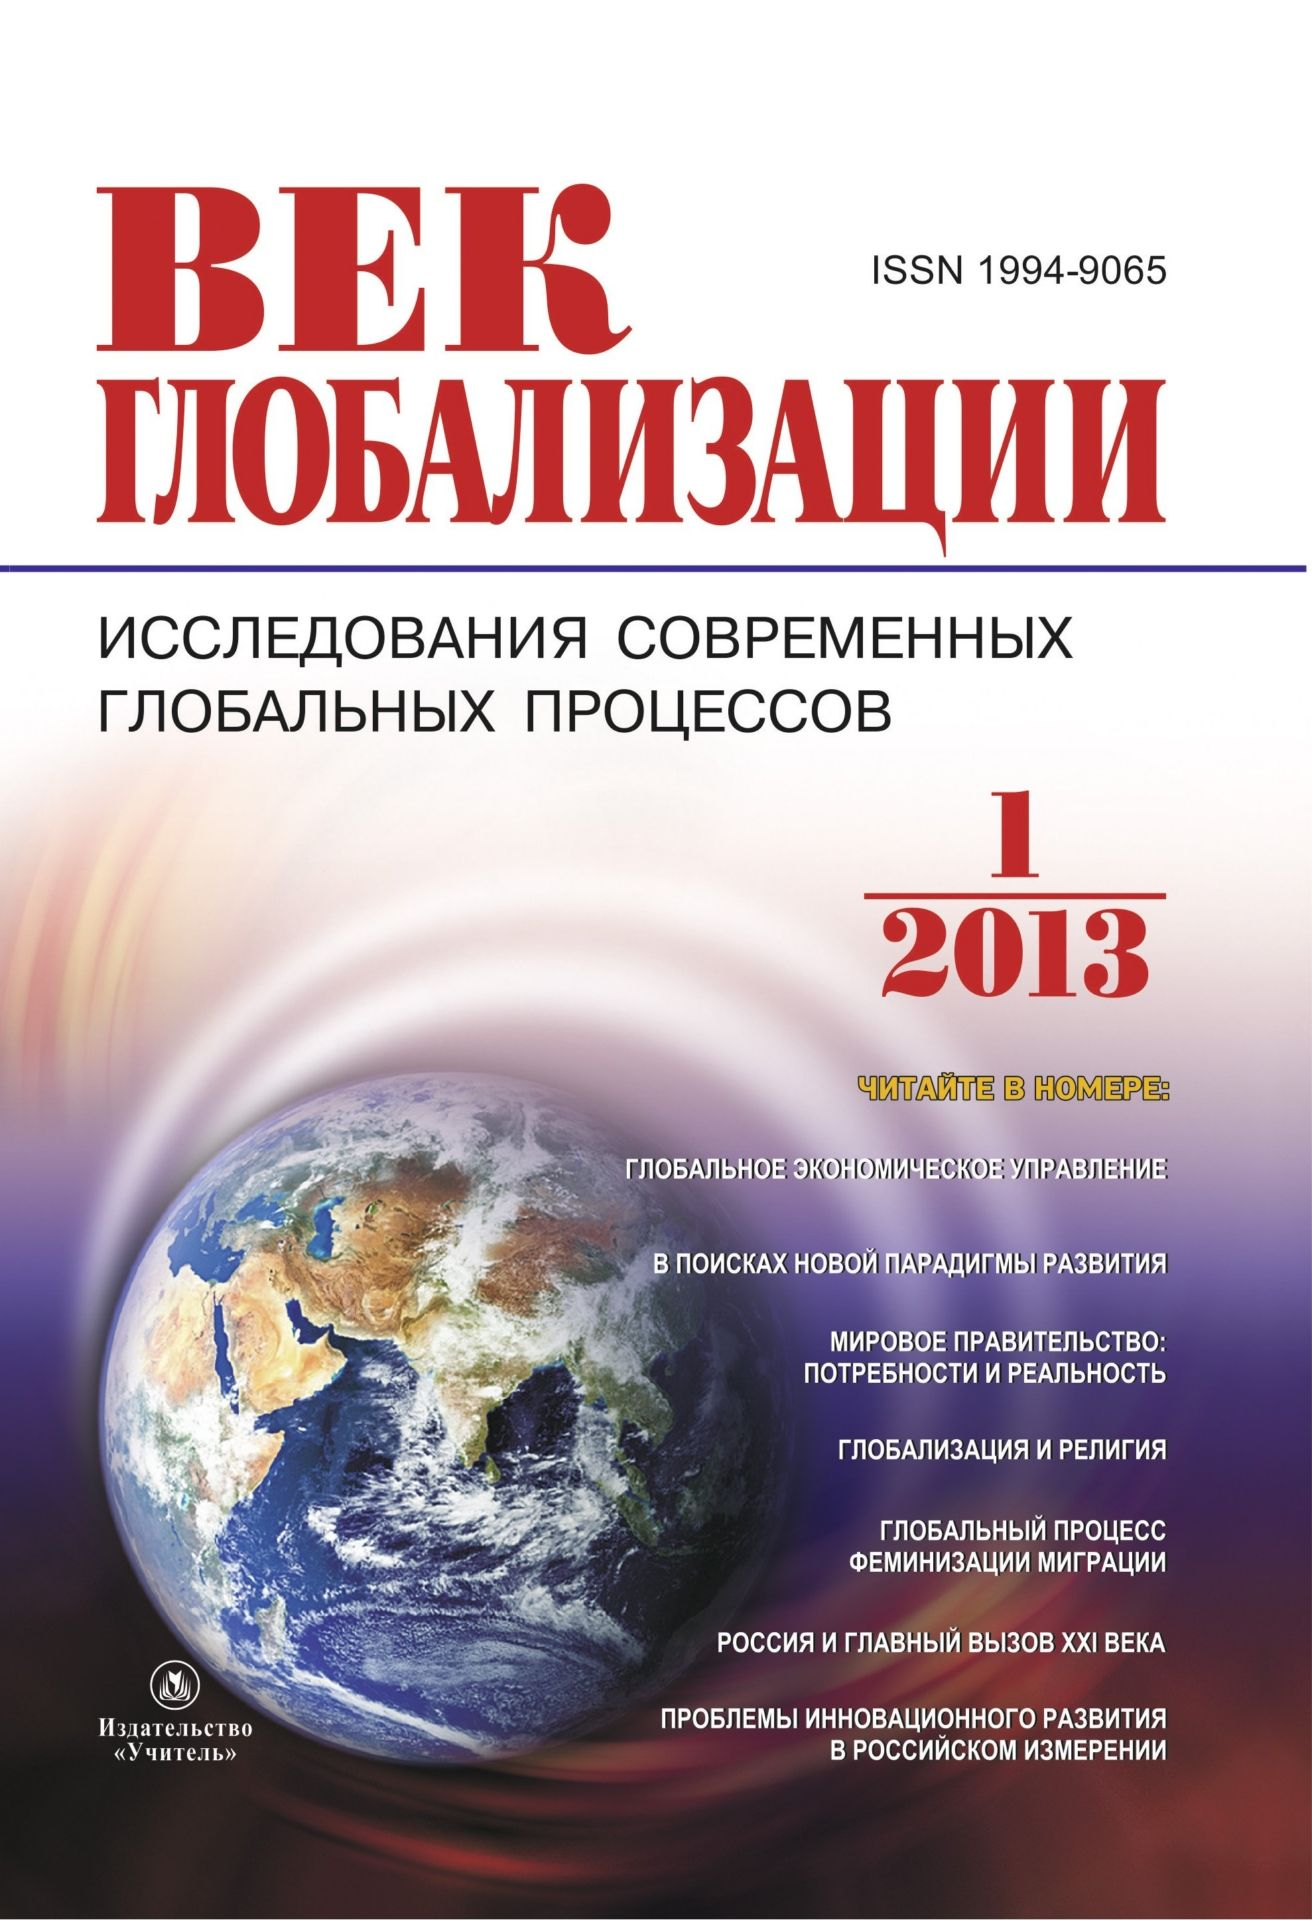 Журнал Век глобализации № 1 2013